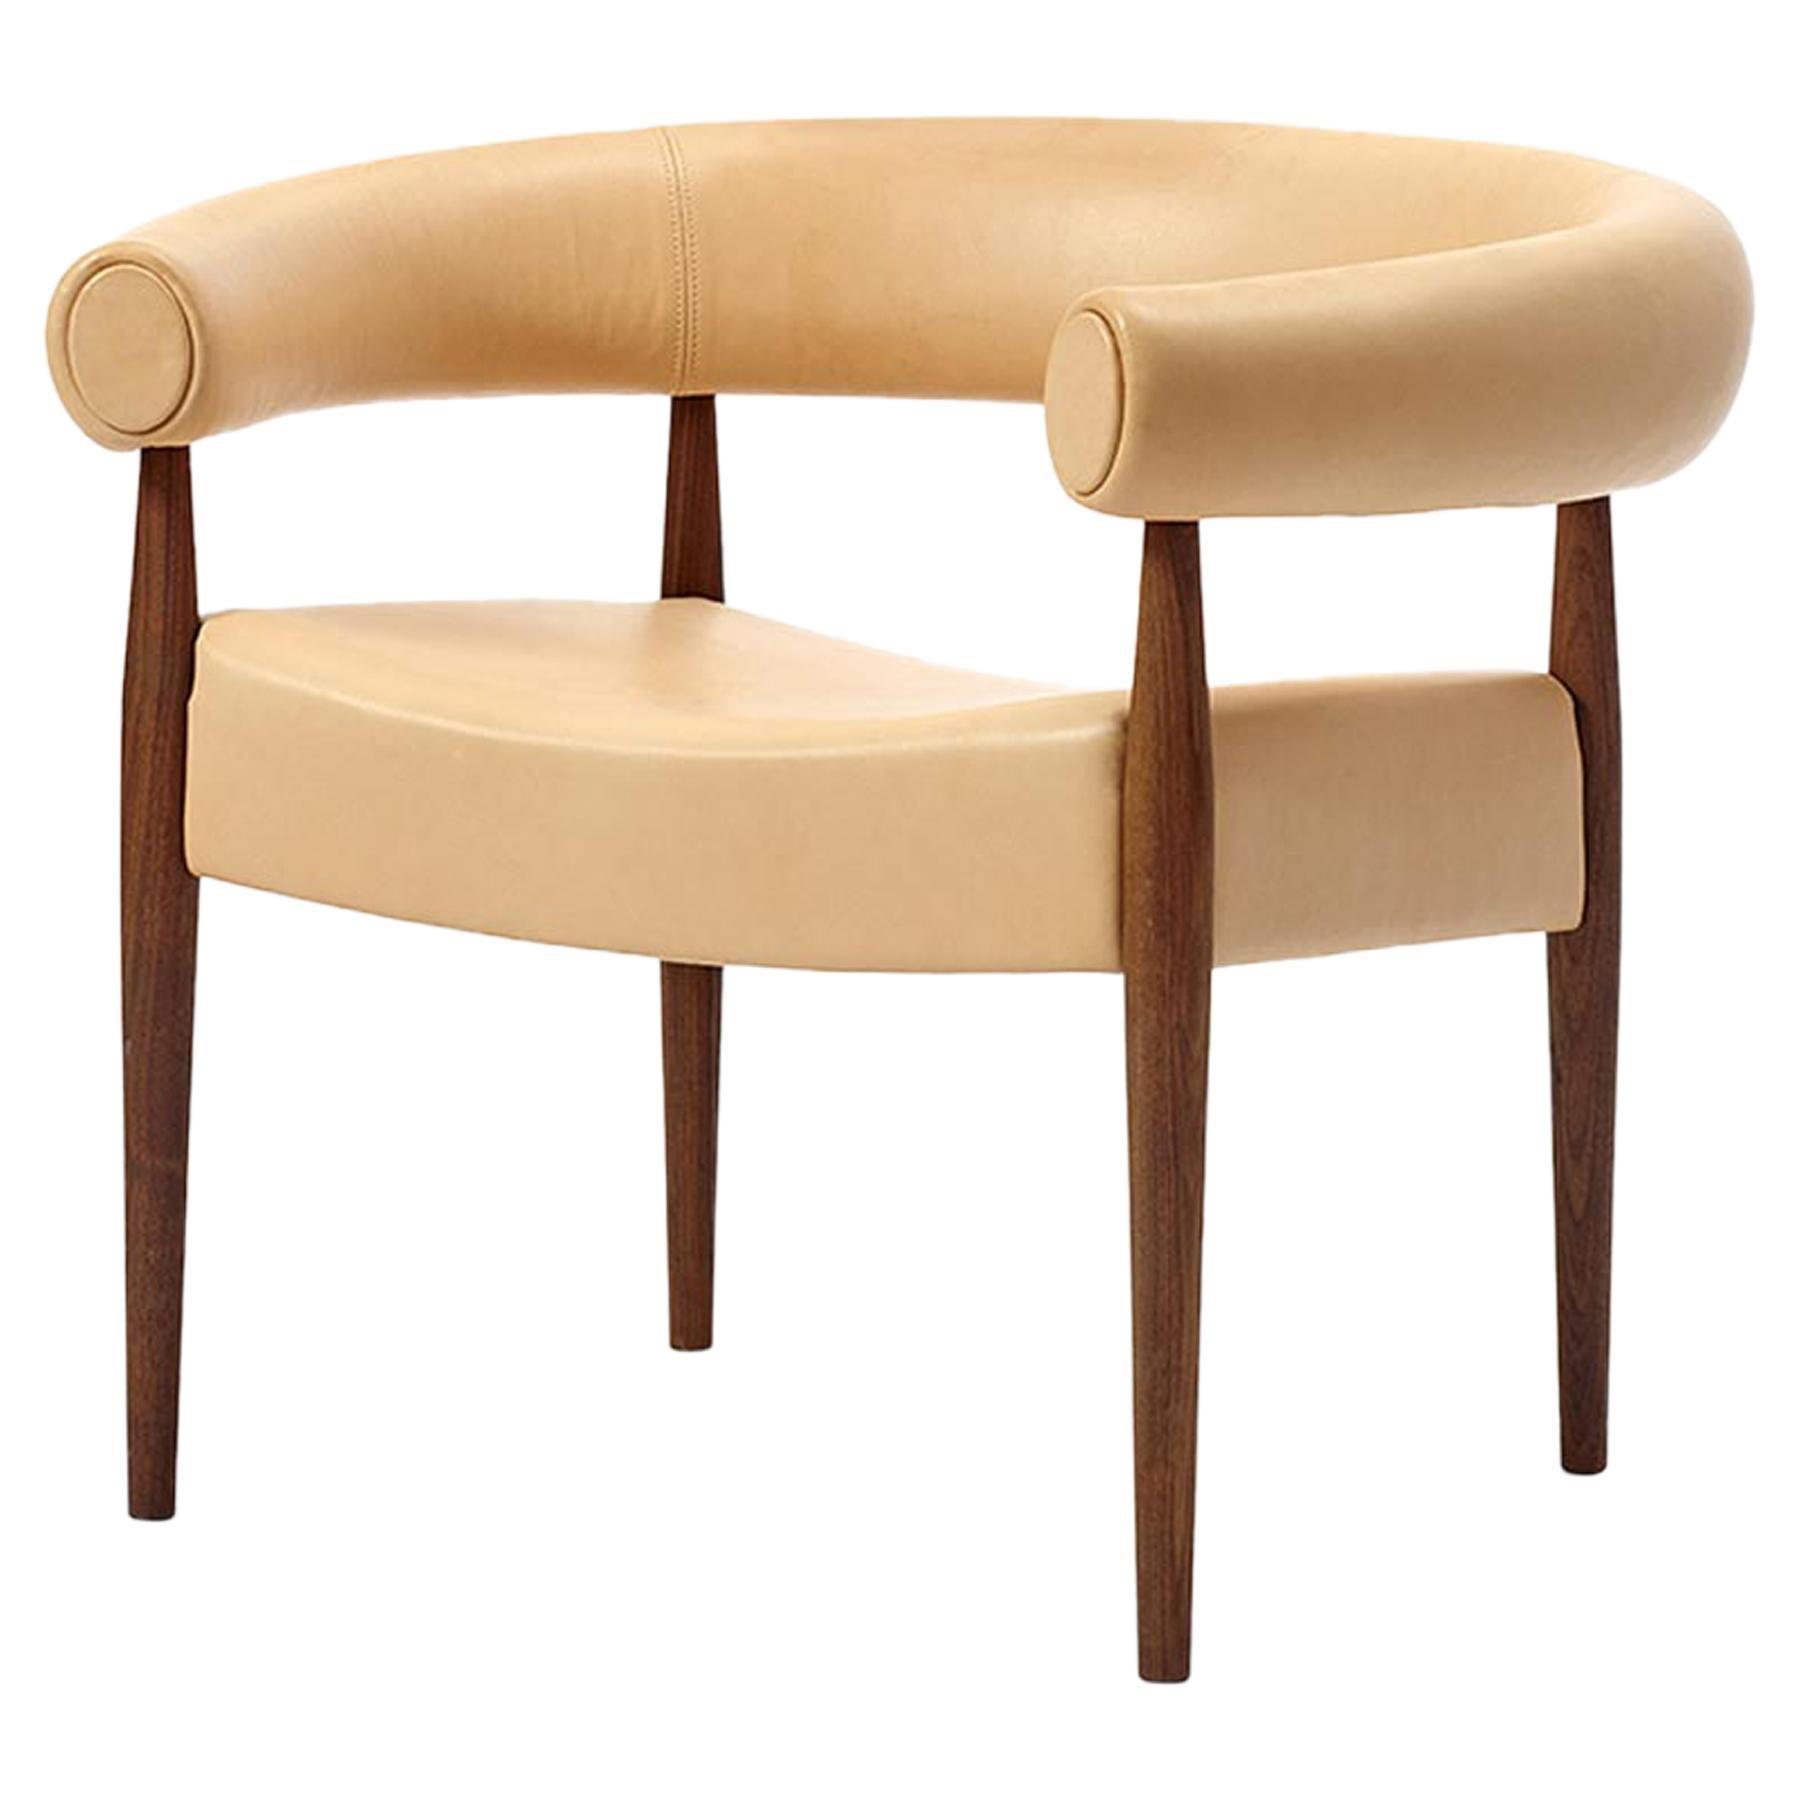 Ring Chair, Nanna & Jorgen Ditzel, Leather